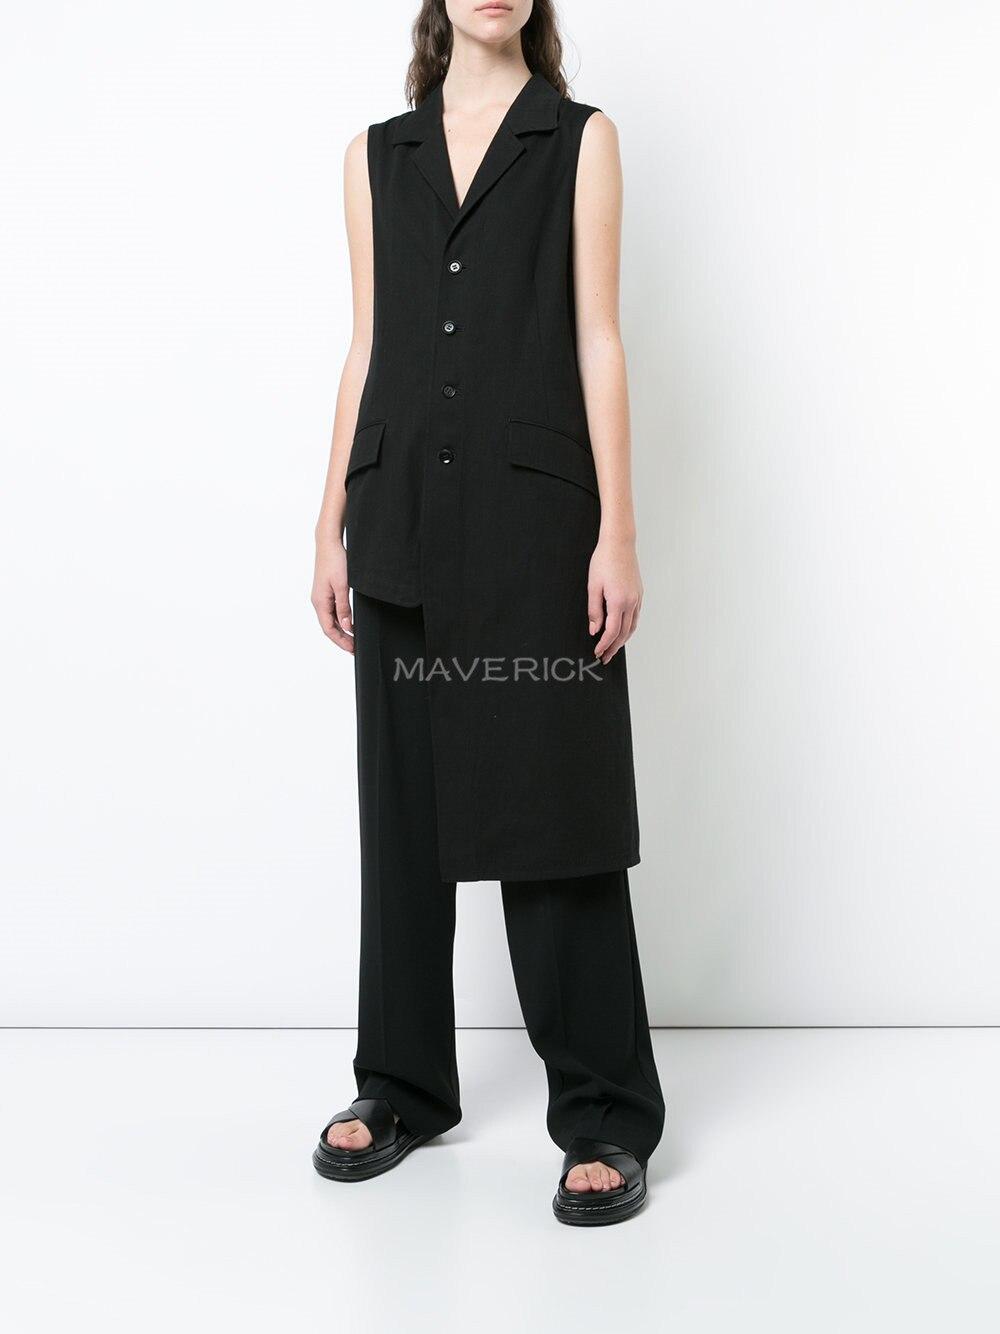 S-6XL!!2019 summer black high street irregularly tailored collar asymmetrical long waistcoat for both men and women.